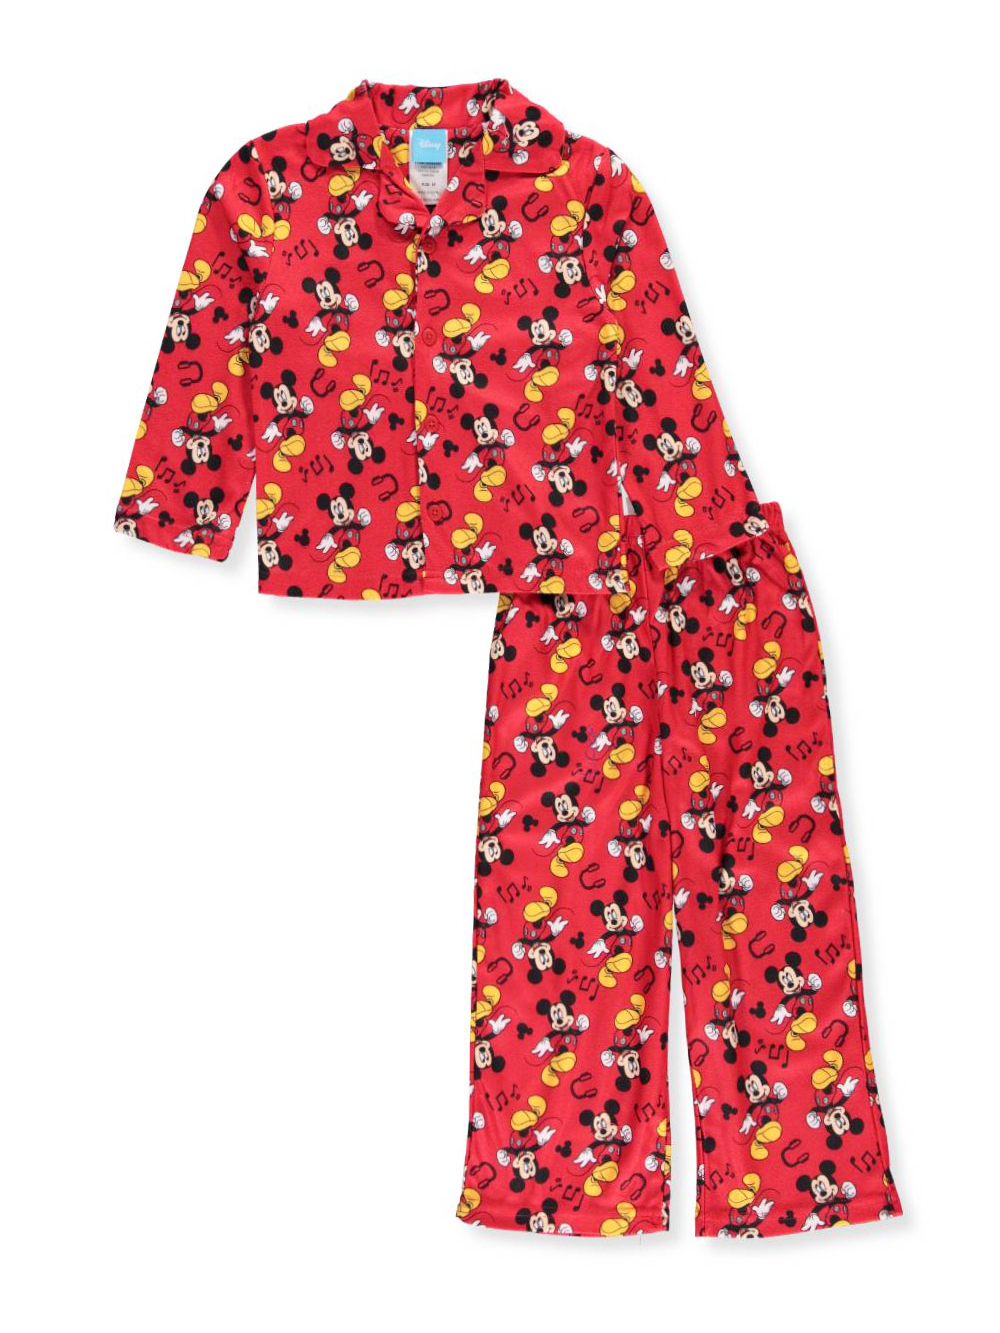 e741311f7 Disney Mickey Mouse Little Boys  Toddler 2-Piece Pajamas (Sizes 2T ...